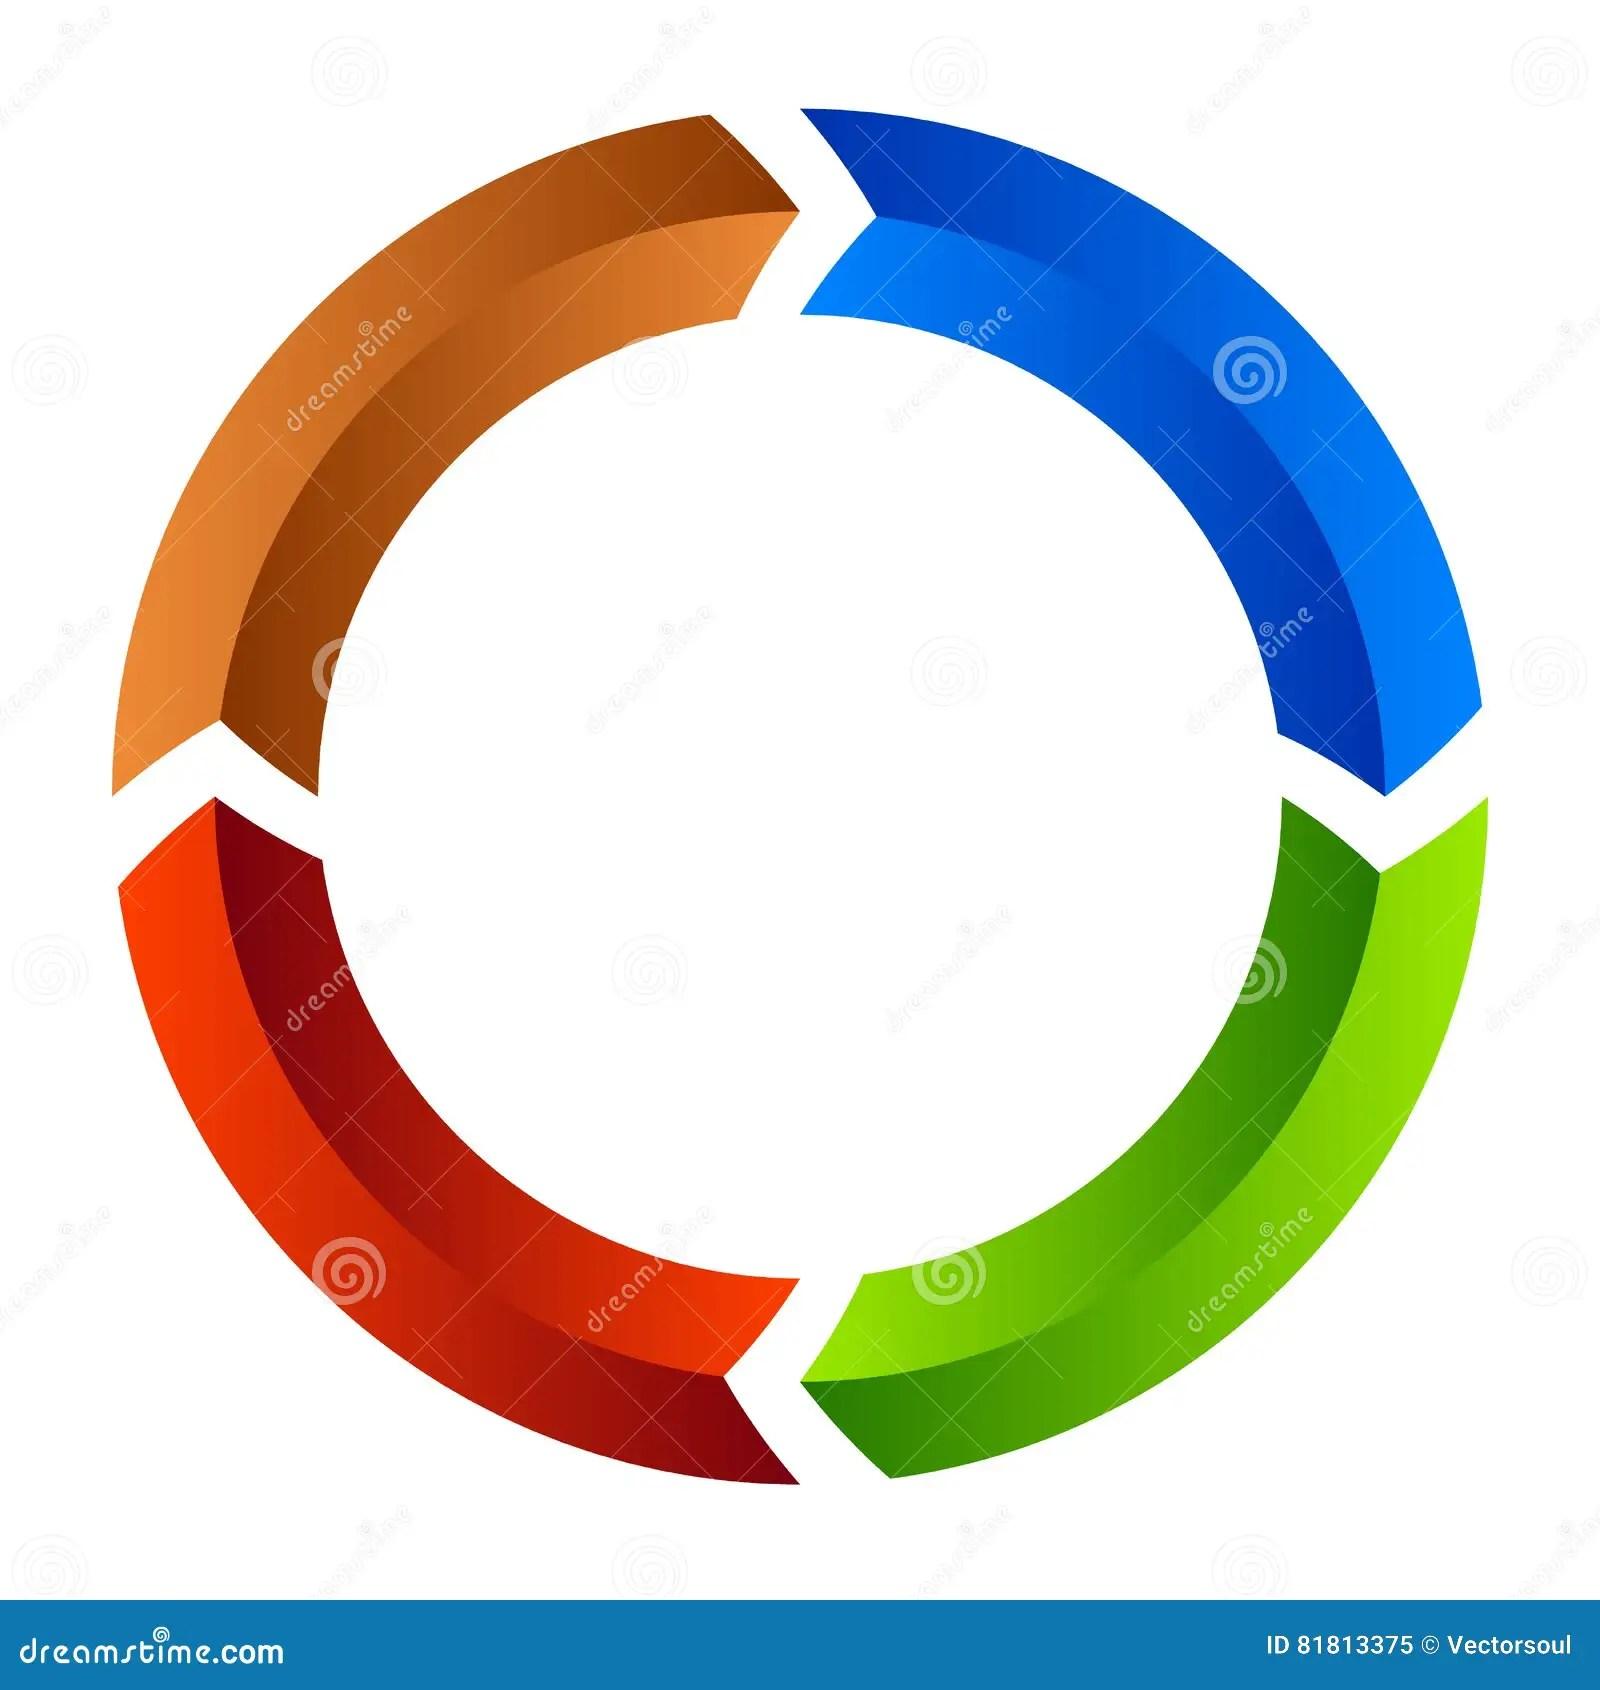 arrow circular process diagram 277v single phase wiring segmented circle icon